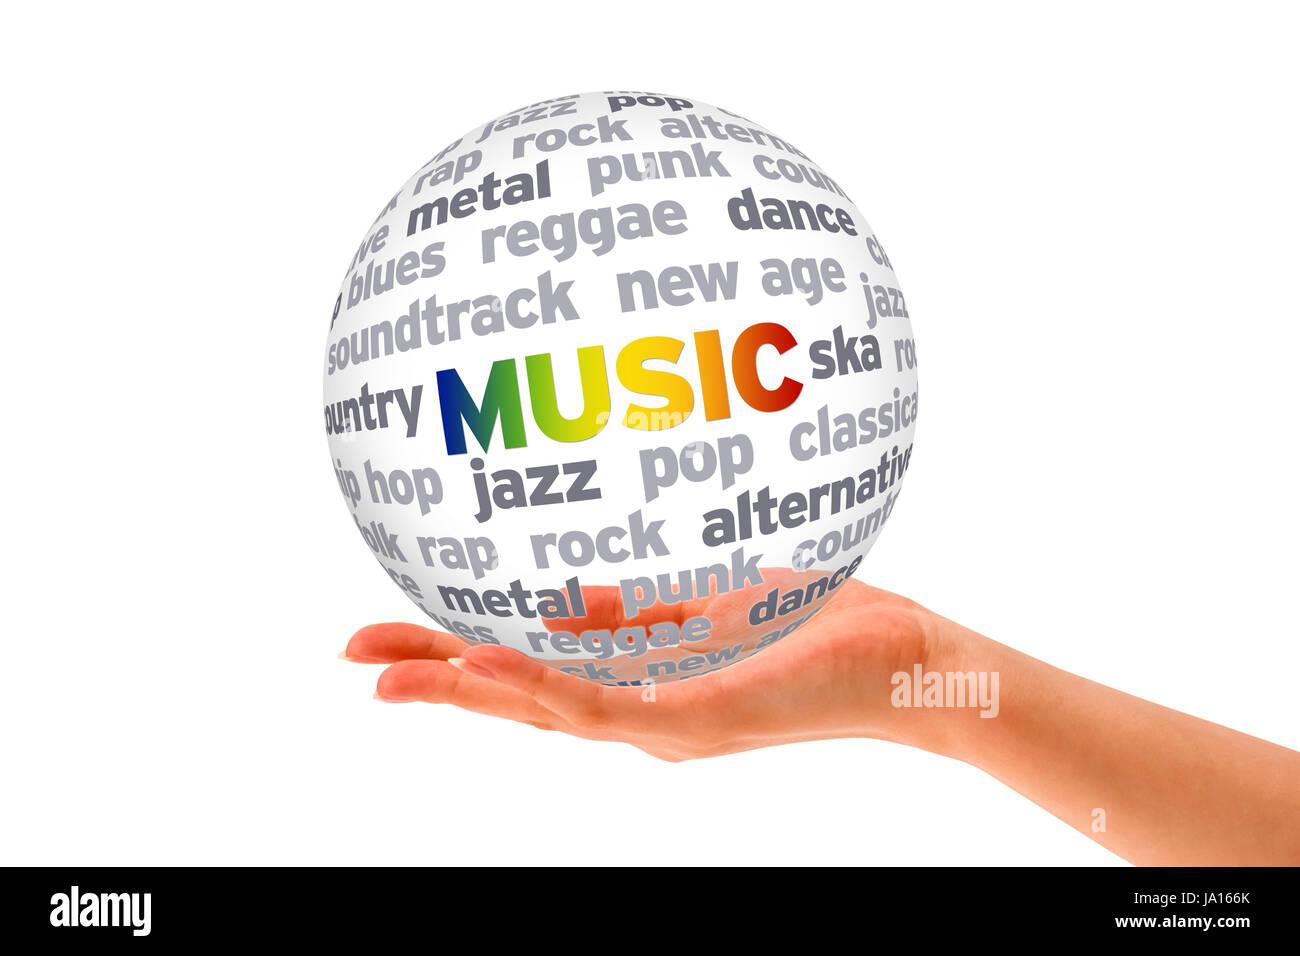 disco, music, classical, alternative, heavy metal, soundtrack, rock, disco, Stock Photo